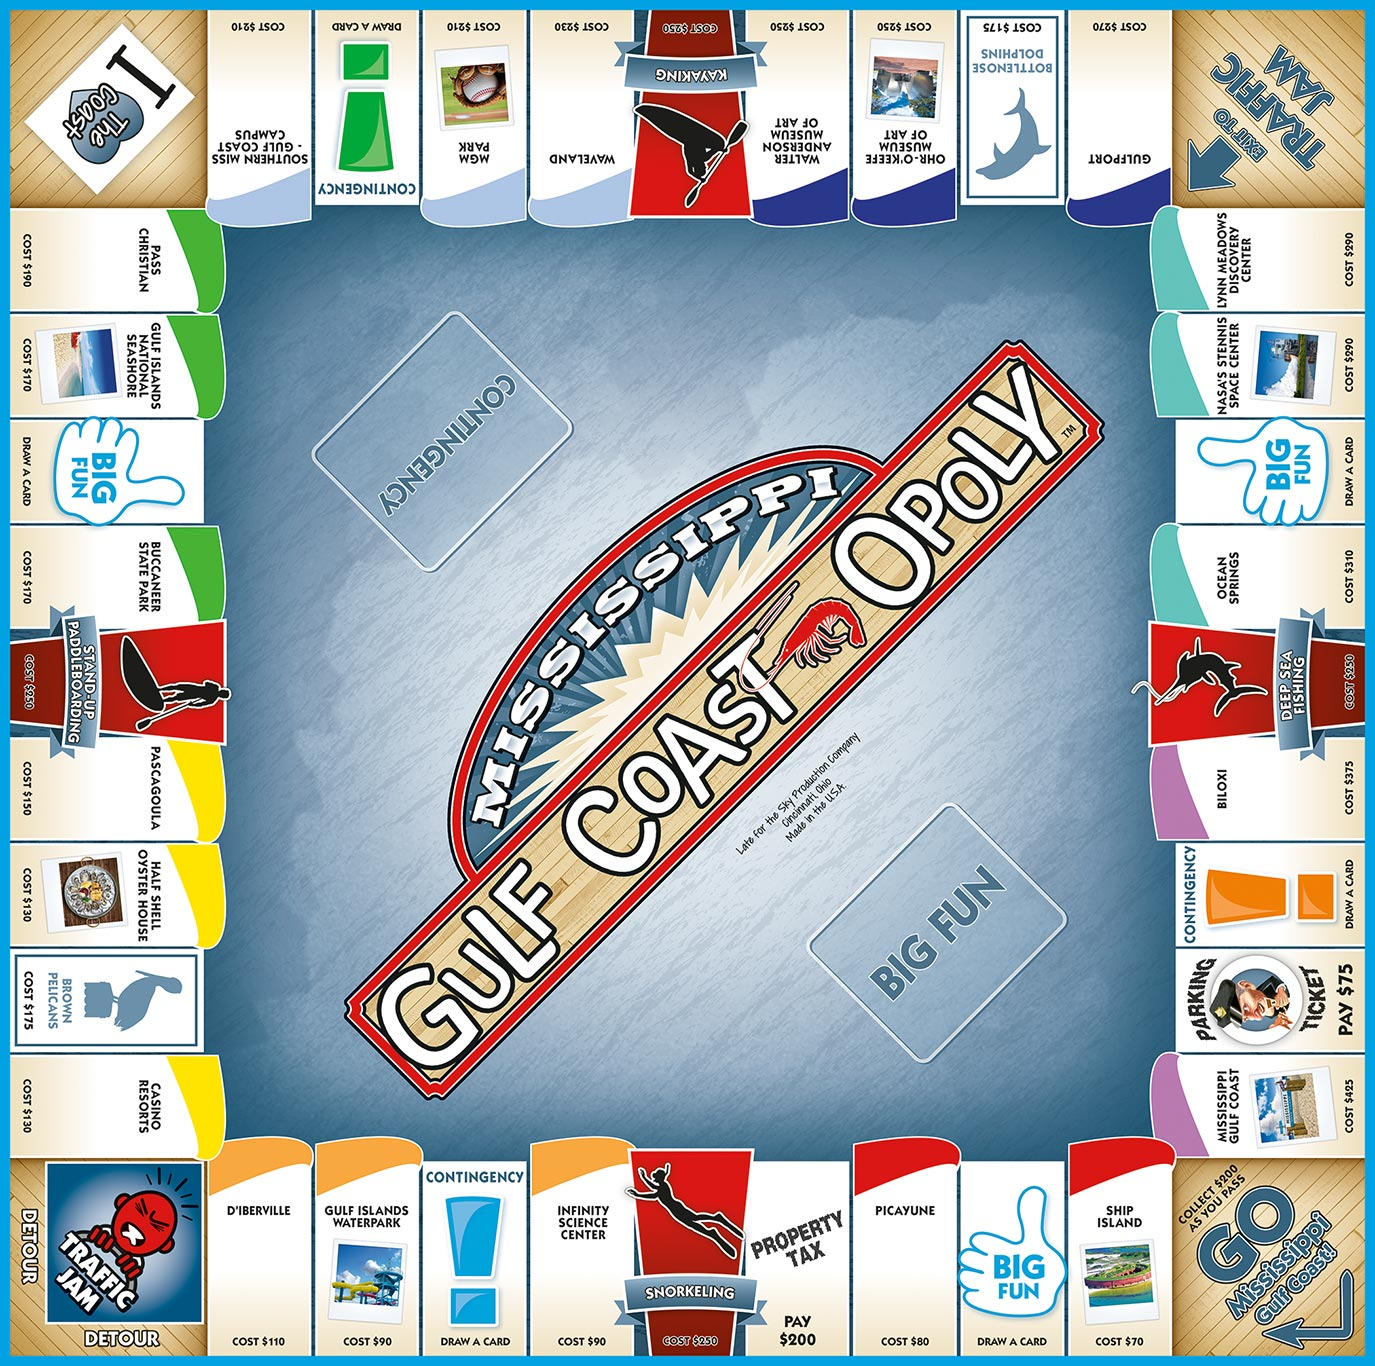 MISSISSIPPI GULF COAST-OPOLY Board Game